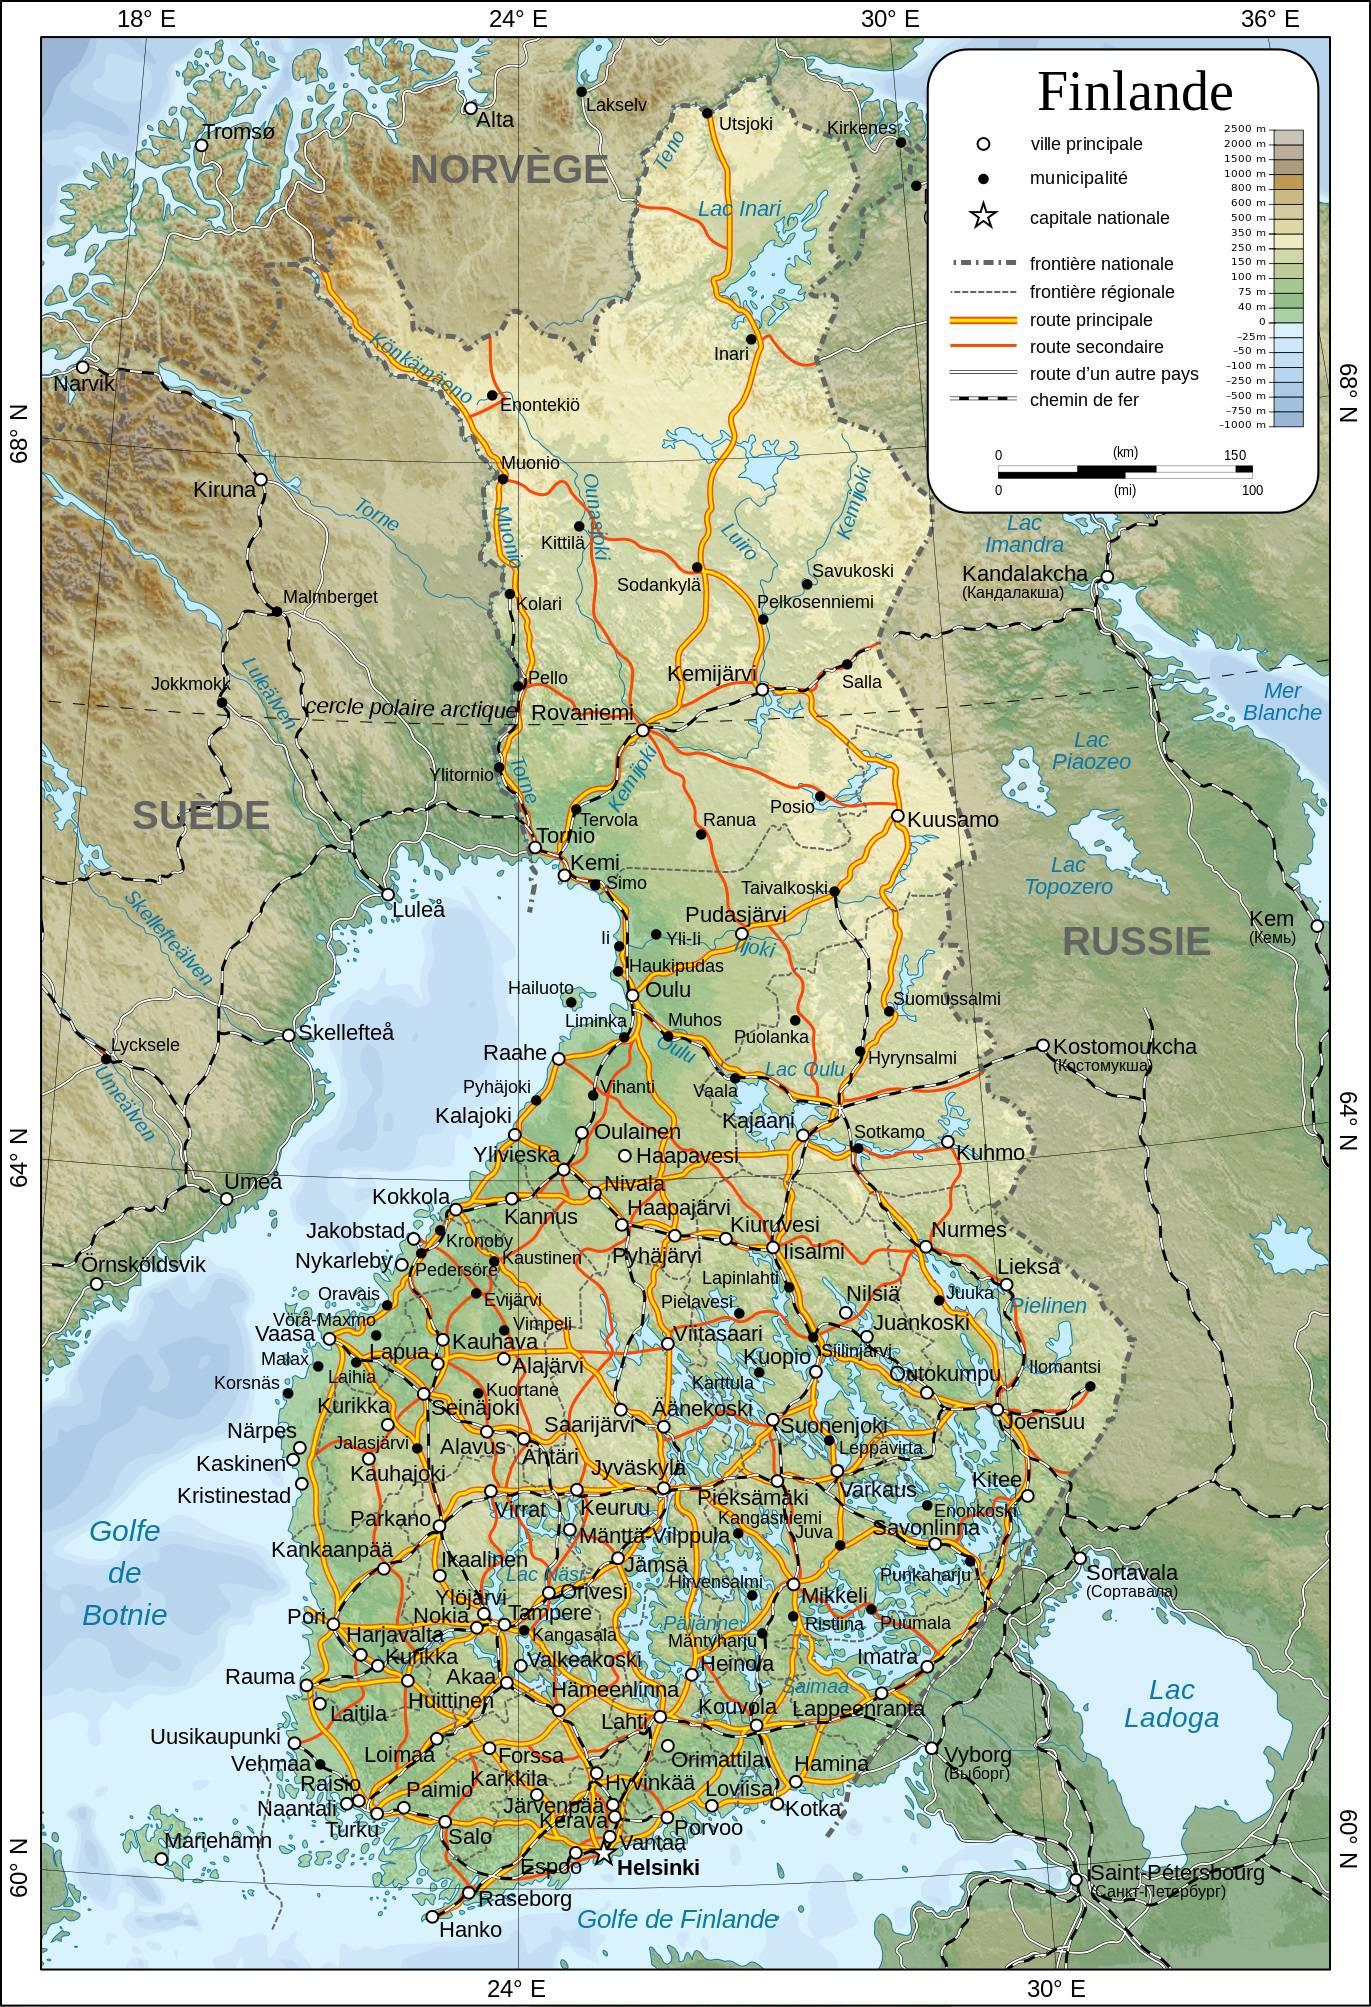 Carte détaillée de la Finlande